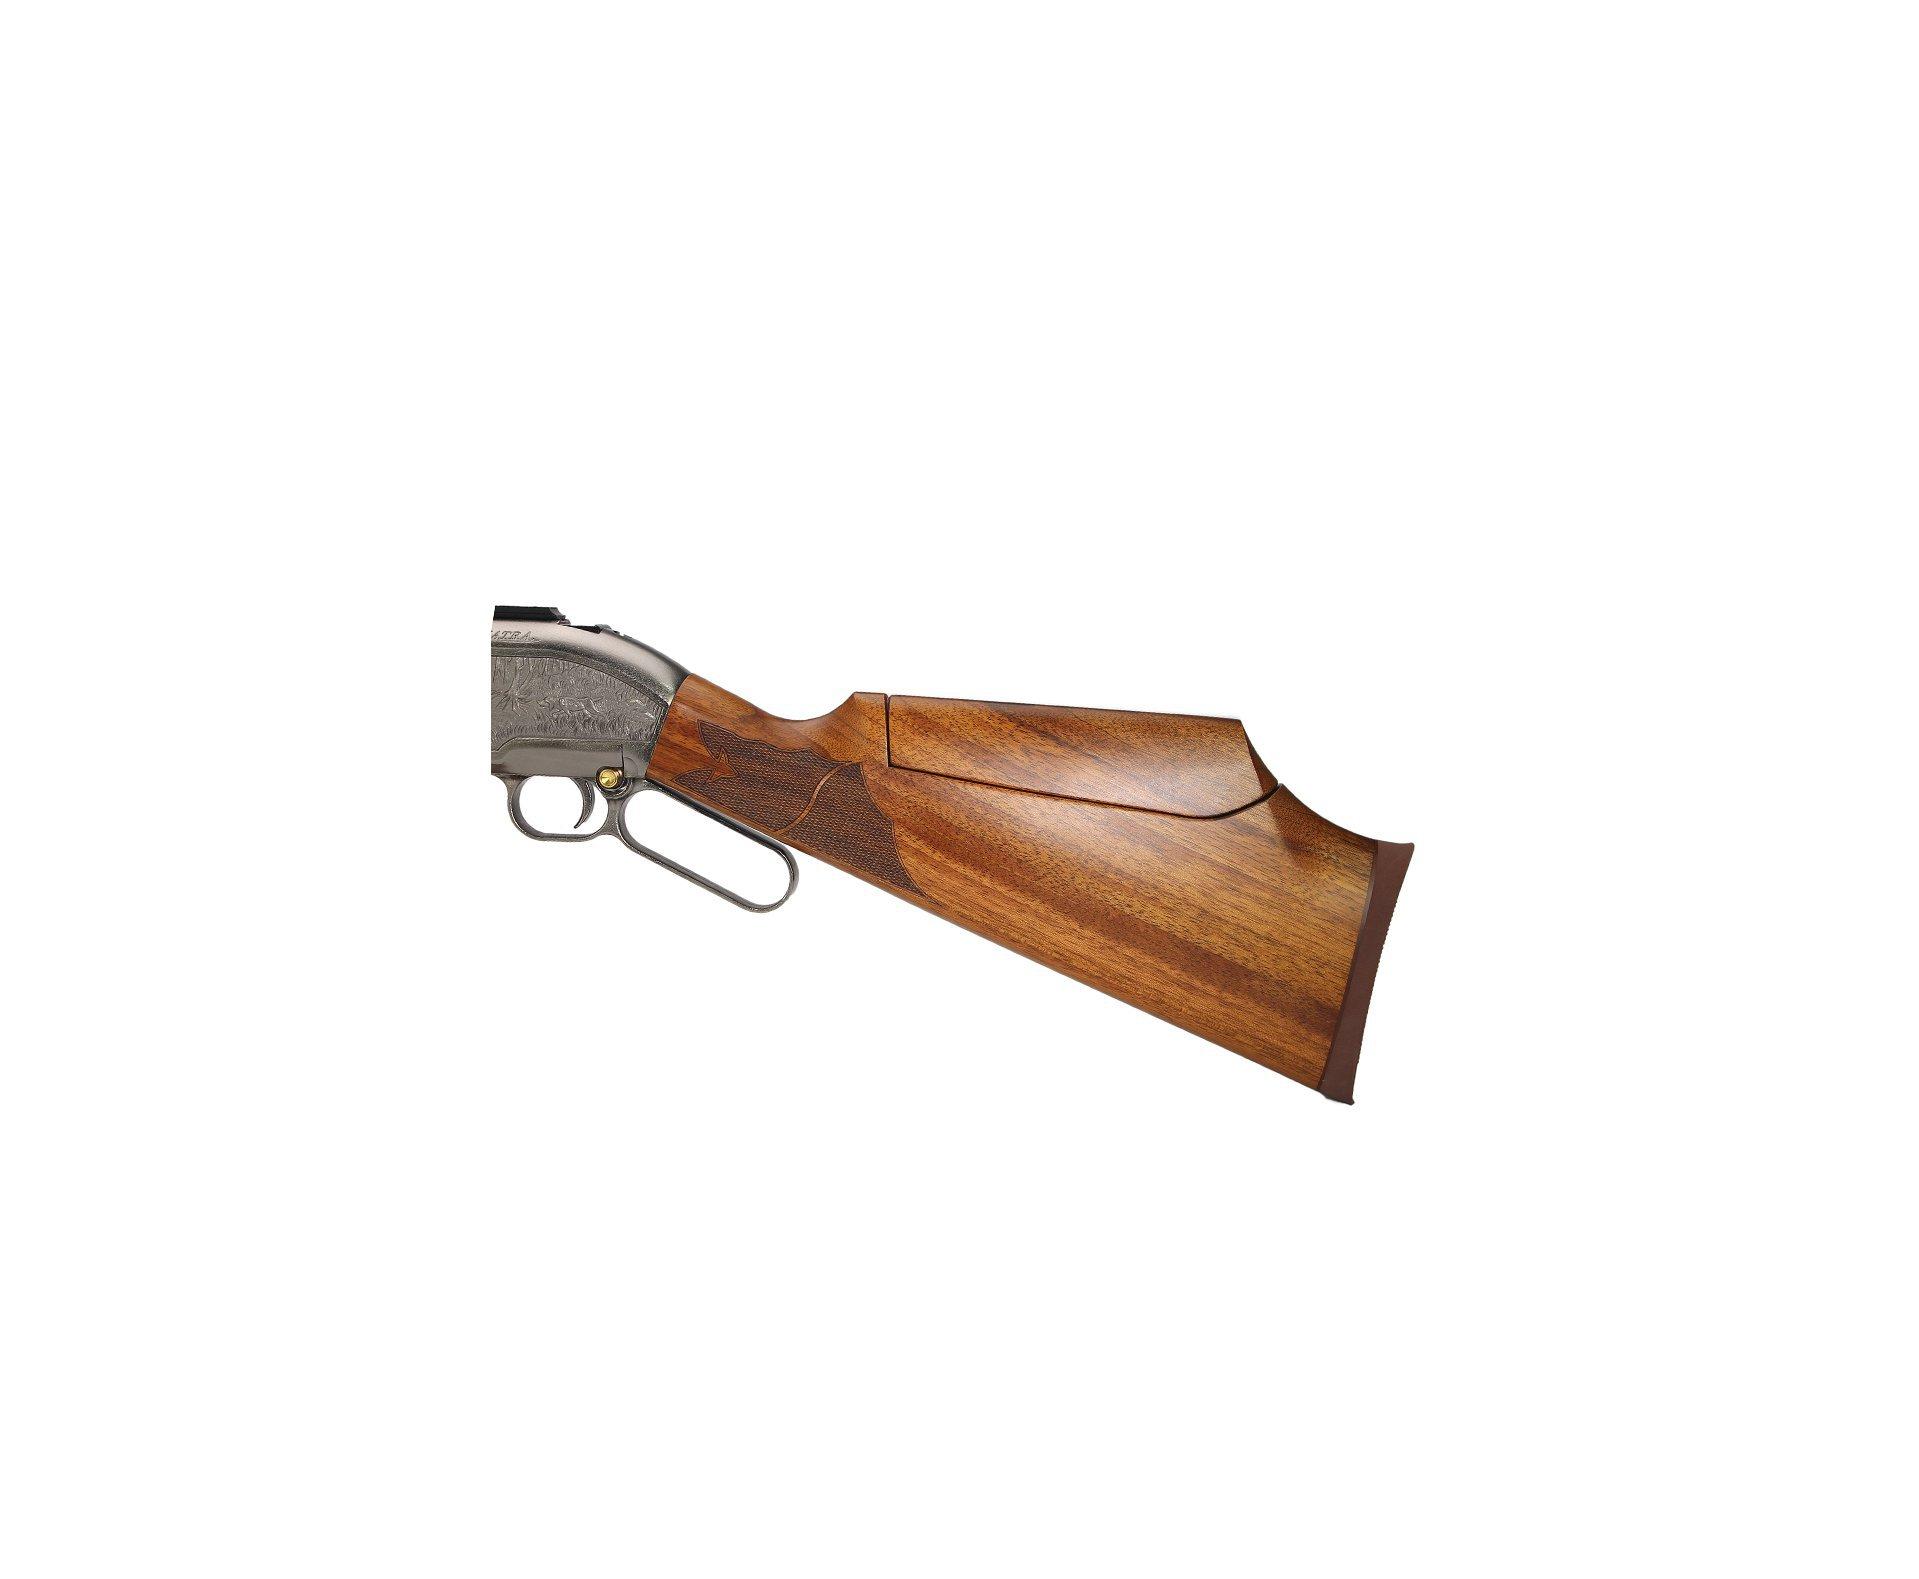 Rifle Sumatra 500 Under Lever Action - Calibre 5.5 Mm